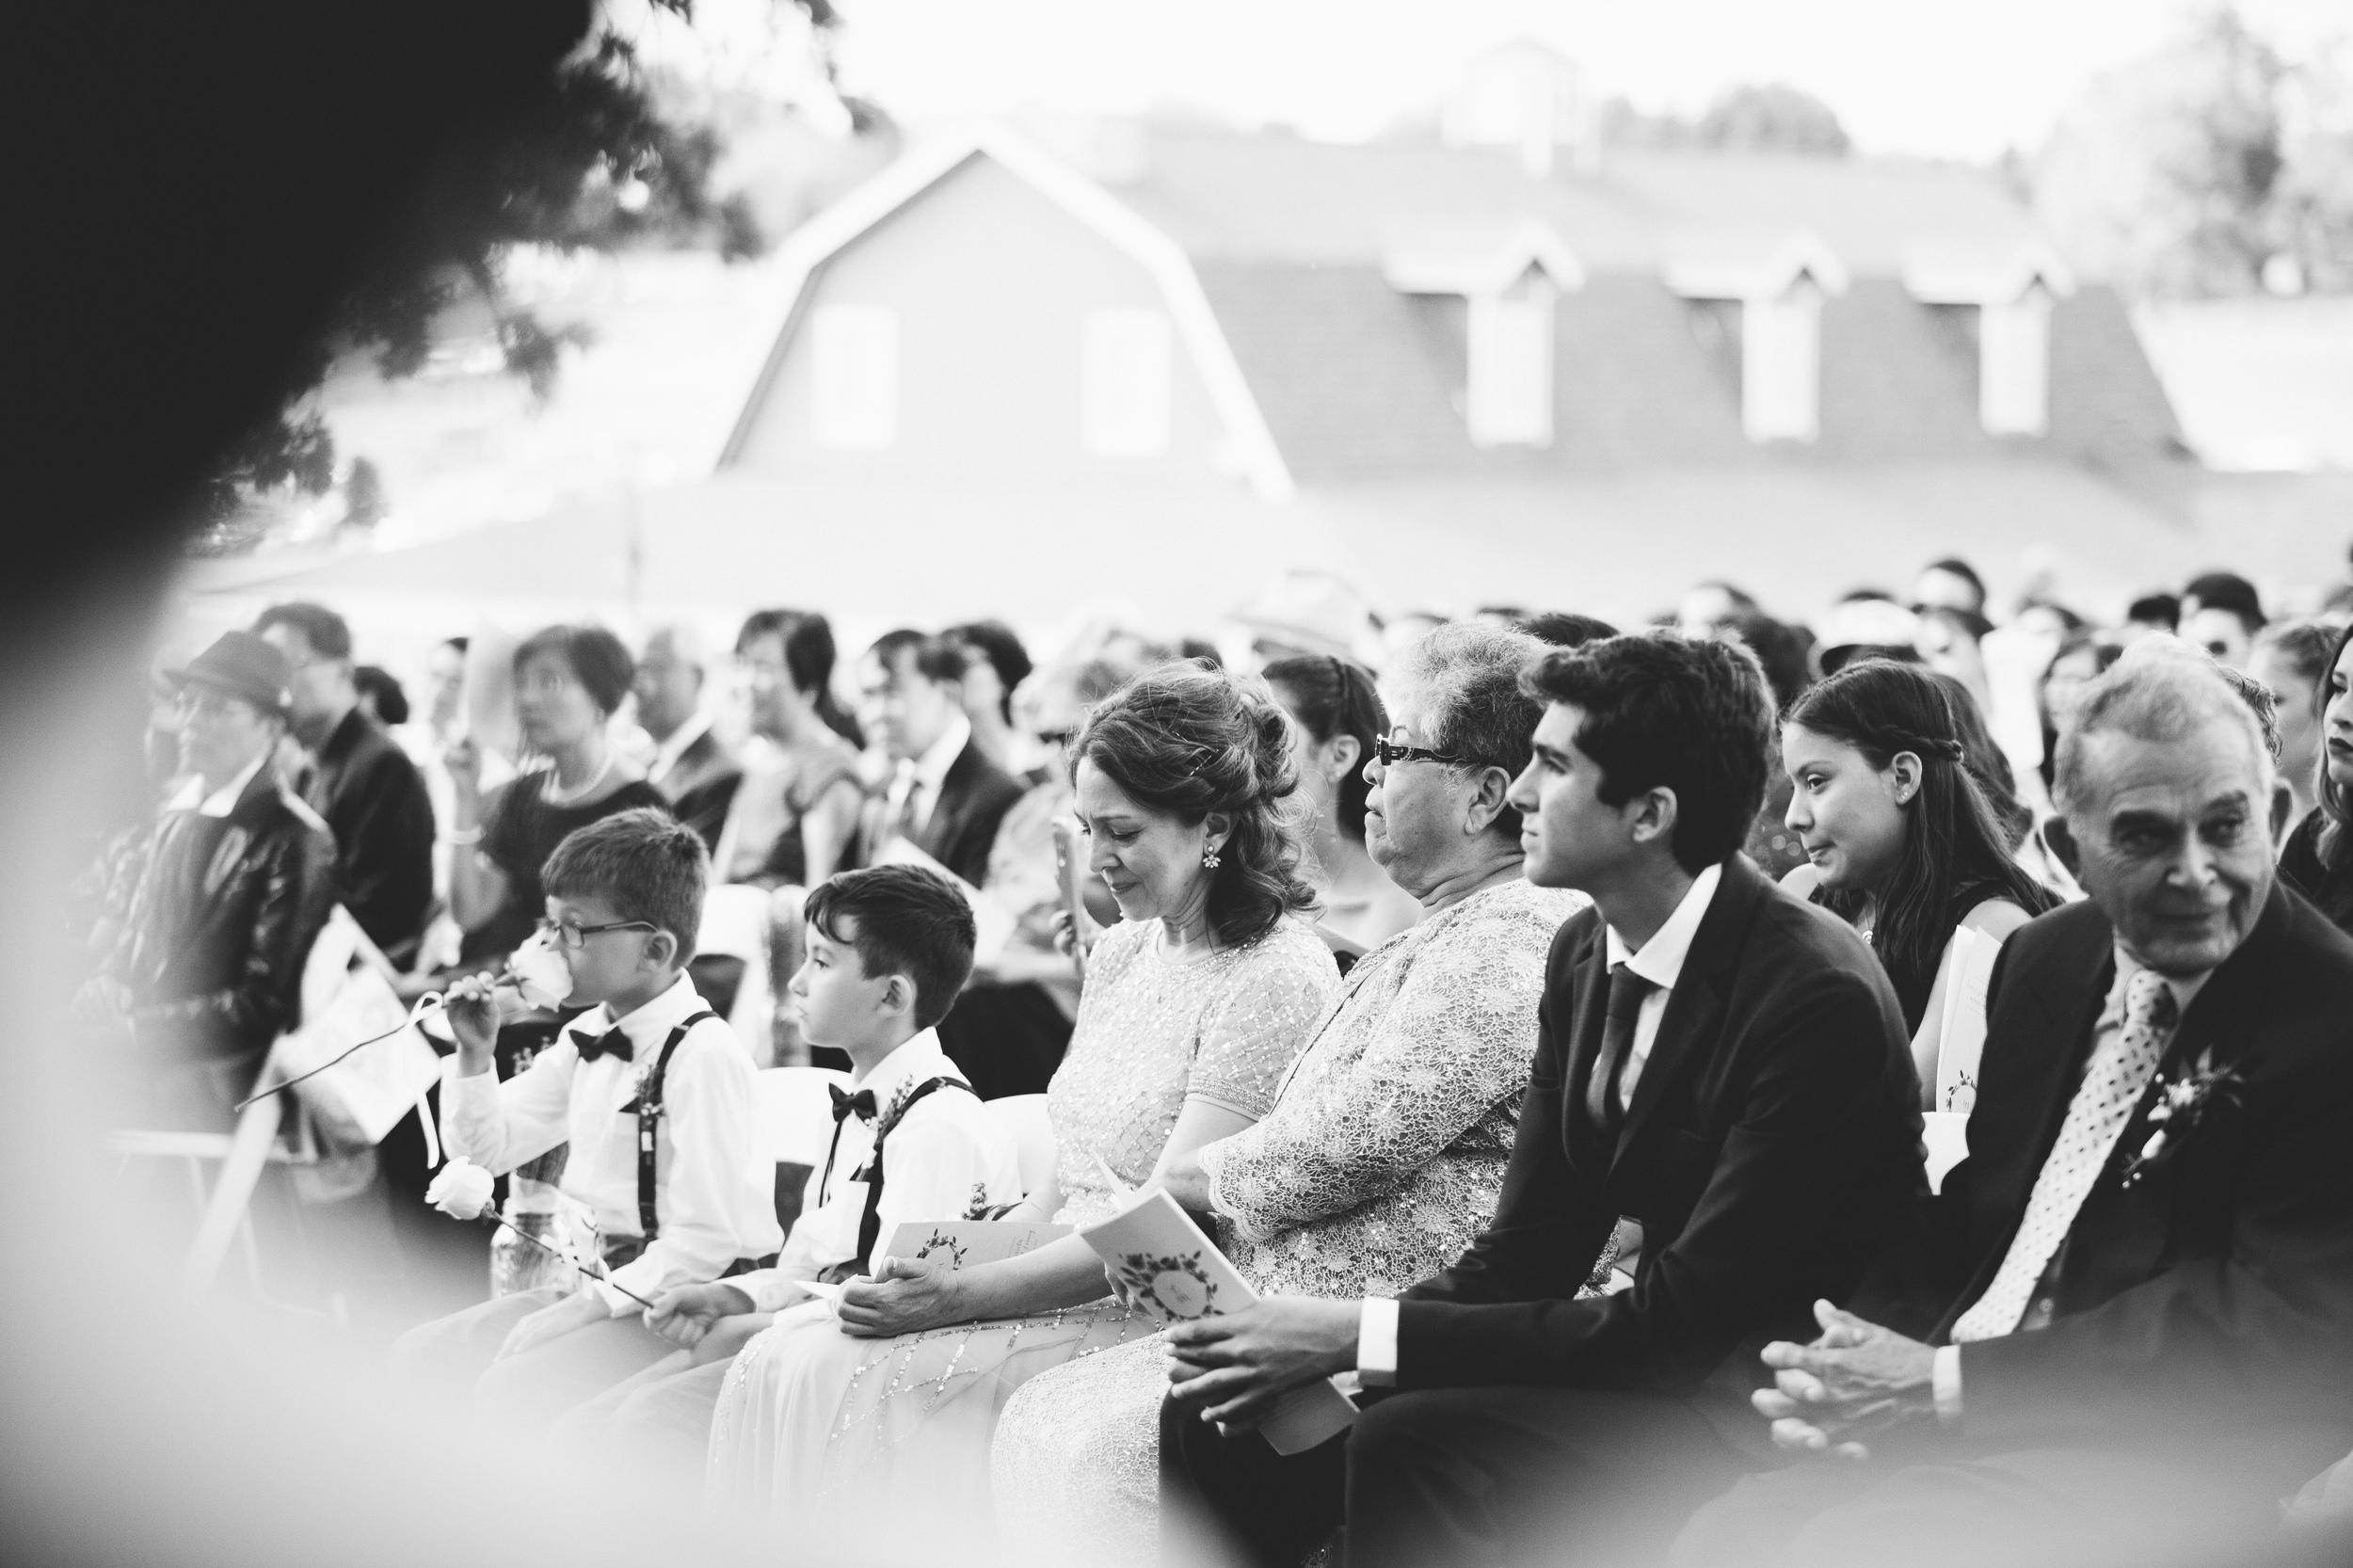 Nicodem Creative_Blog_Leung Wedding_The Pavilion at Orchad Ridge Farms_Rockton Illinois-36.jpg